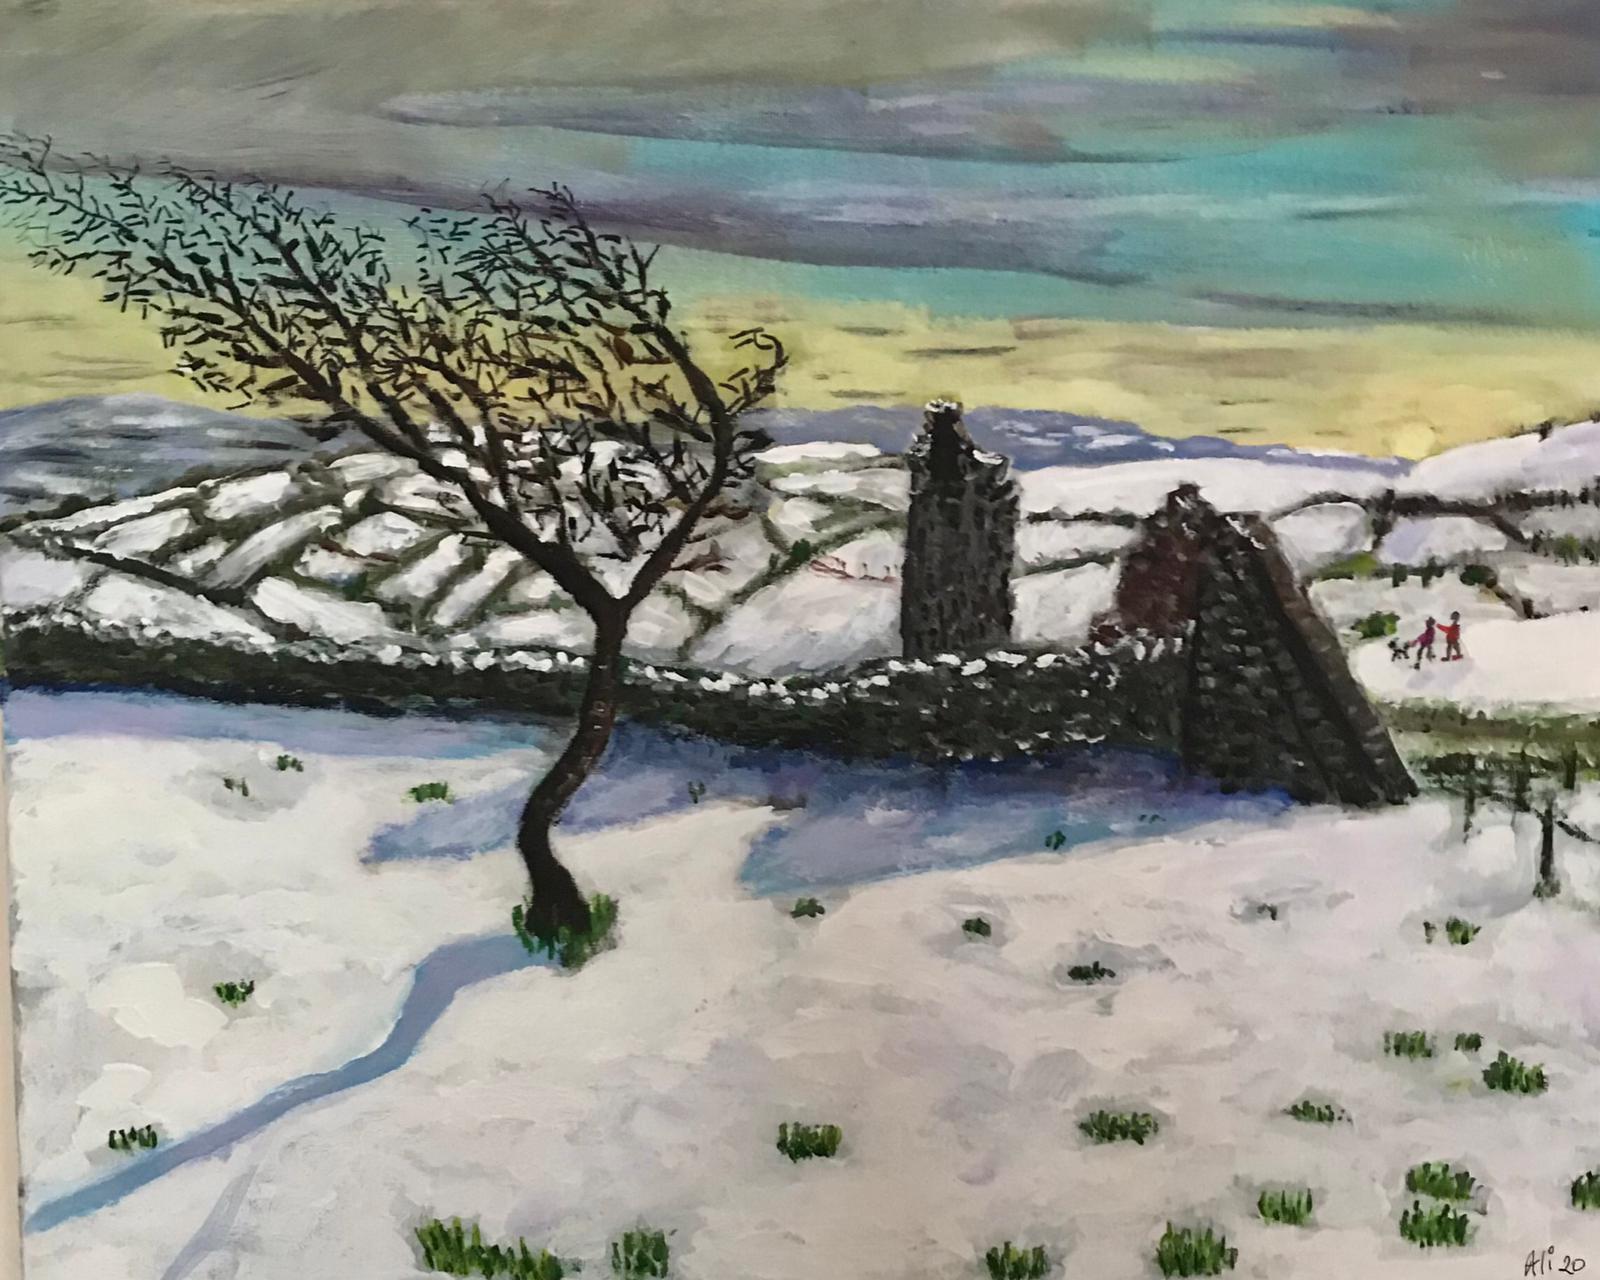 Shedding Light on Cornwall, an Artist's Delight